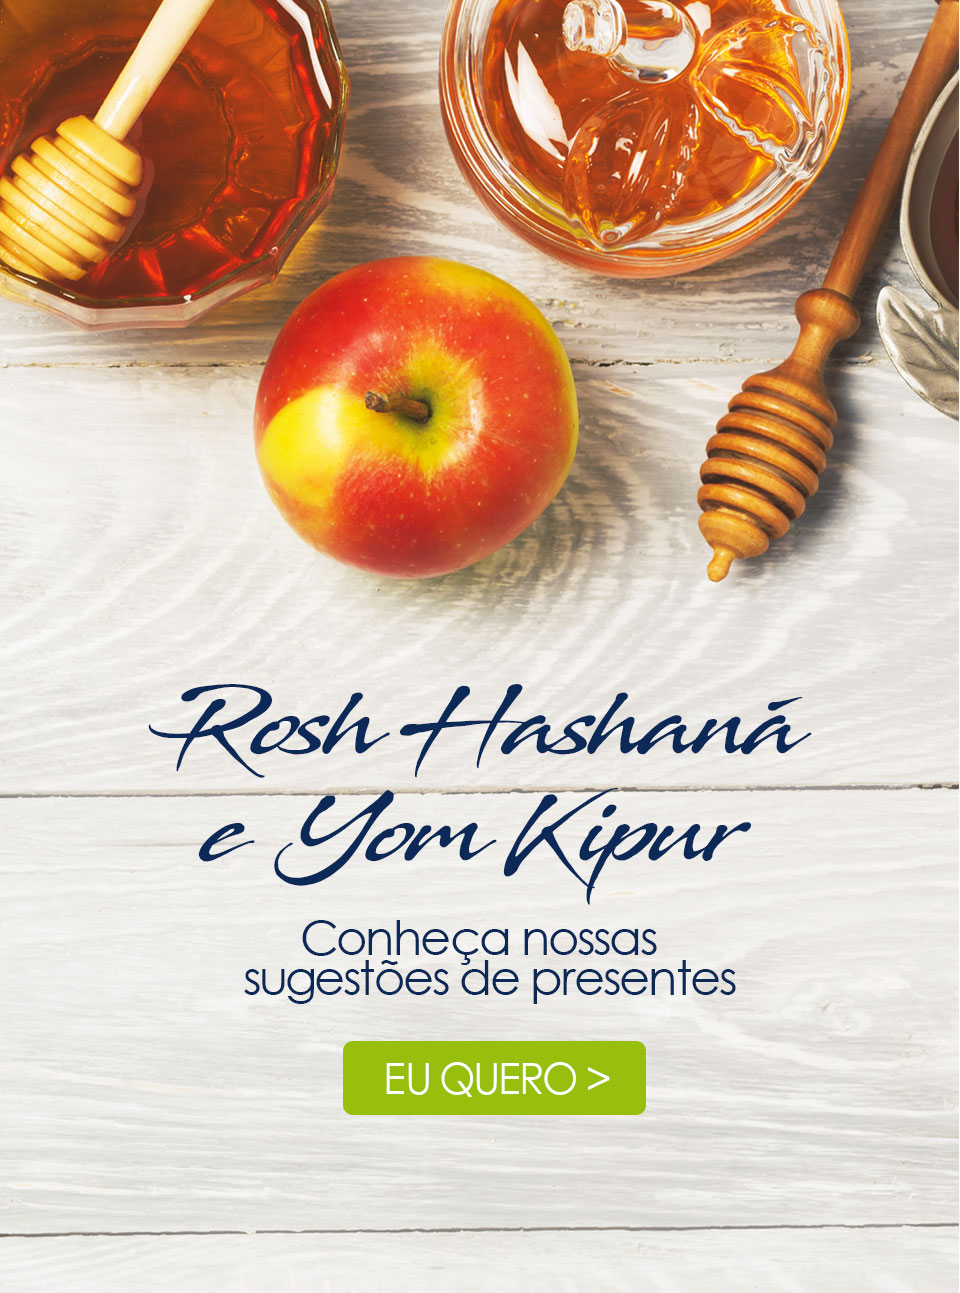 Rosh Hashana Mobile